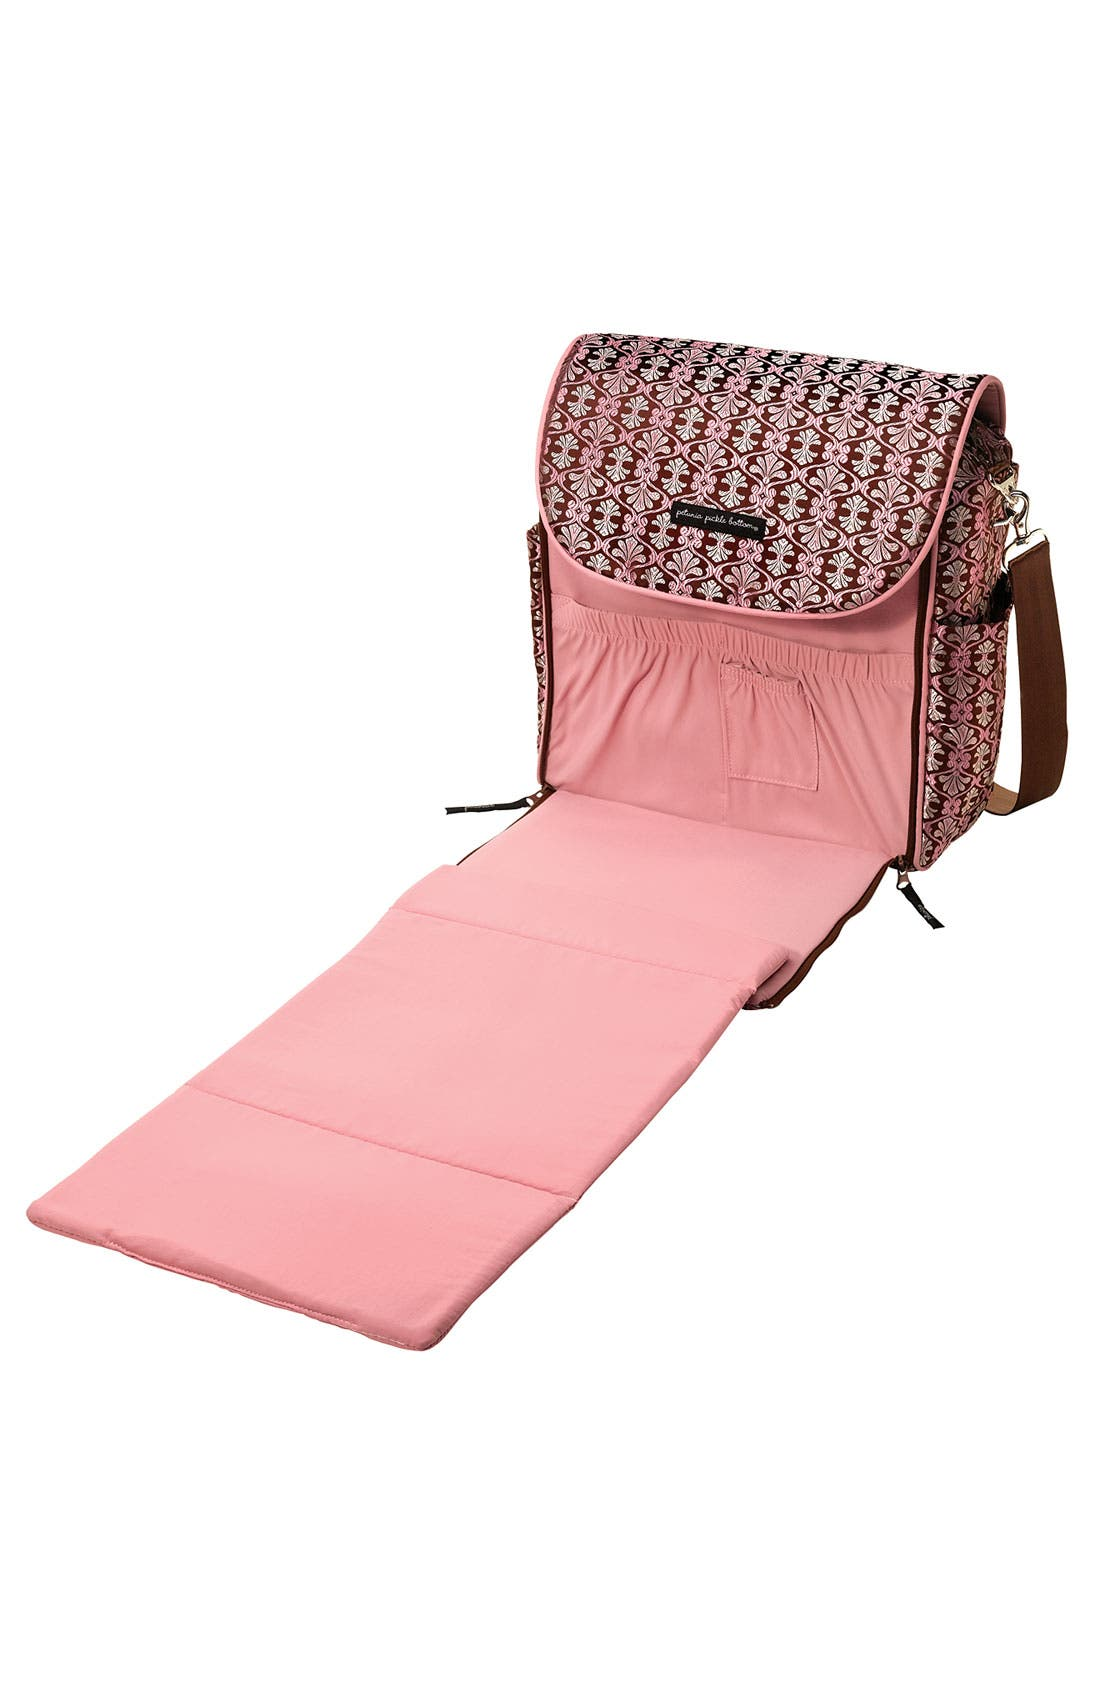 Alternate Image 3  - Petunia Pickle Bottom Brocade 'Boxy Backpack' Diaper Bag